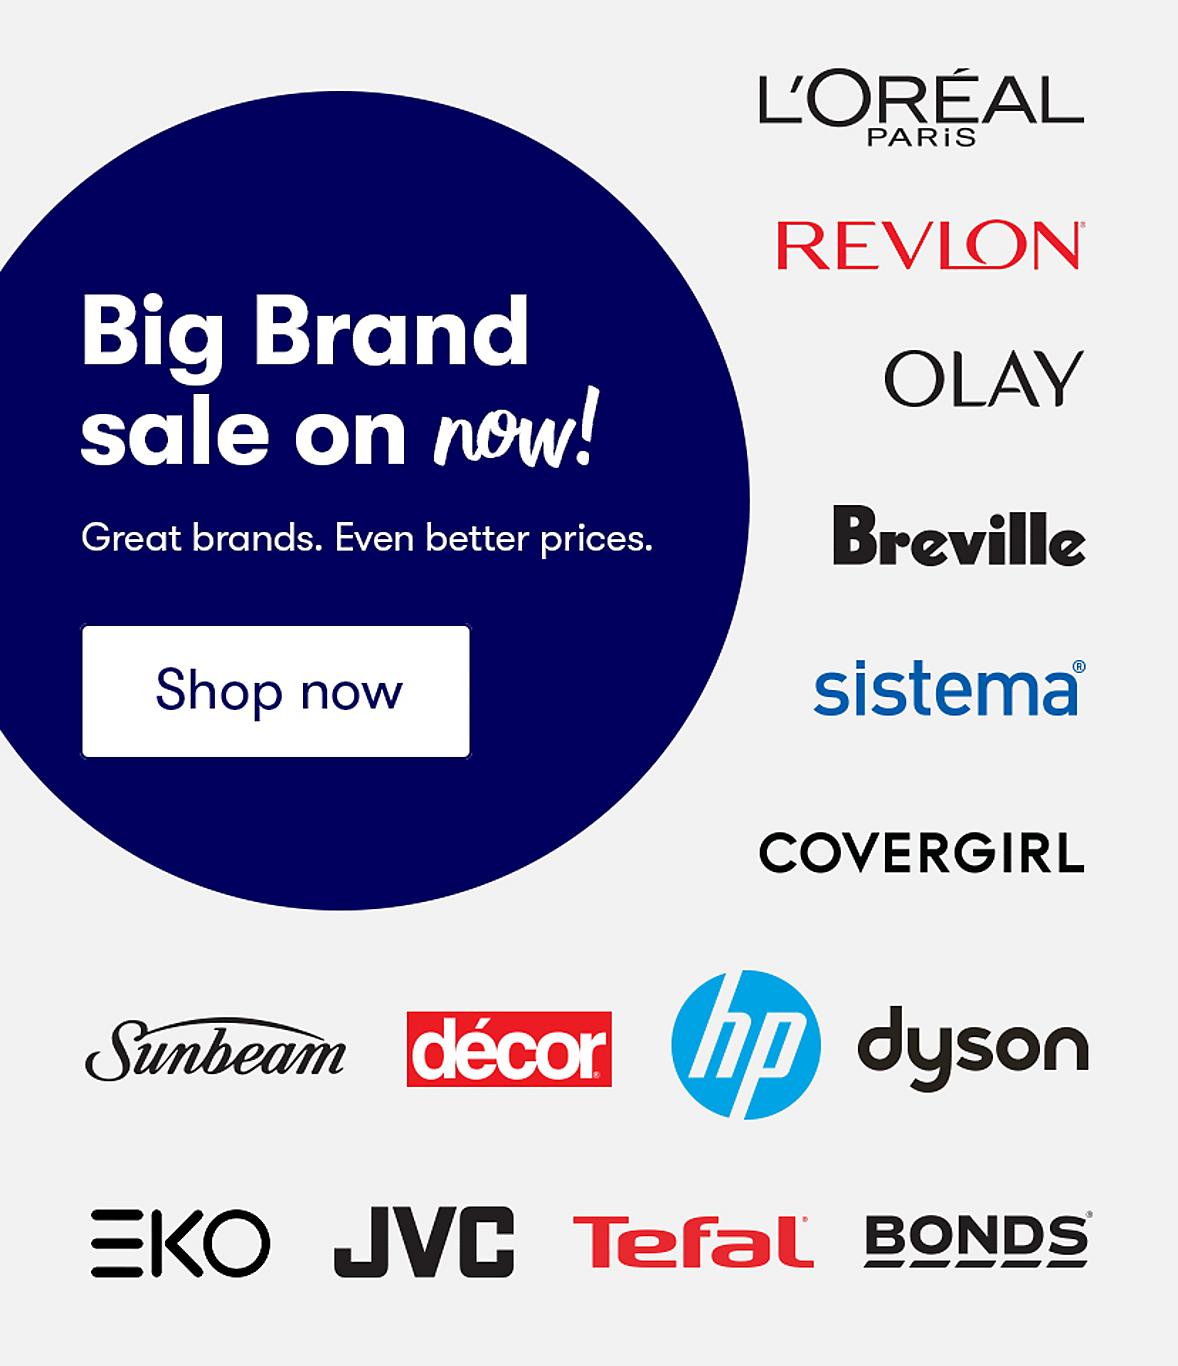 Big Brands on Sale now